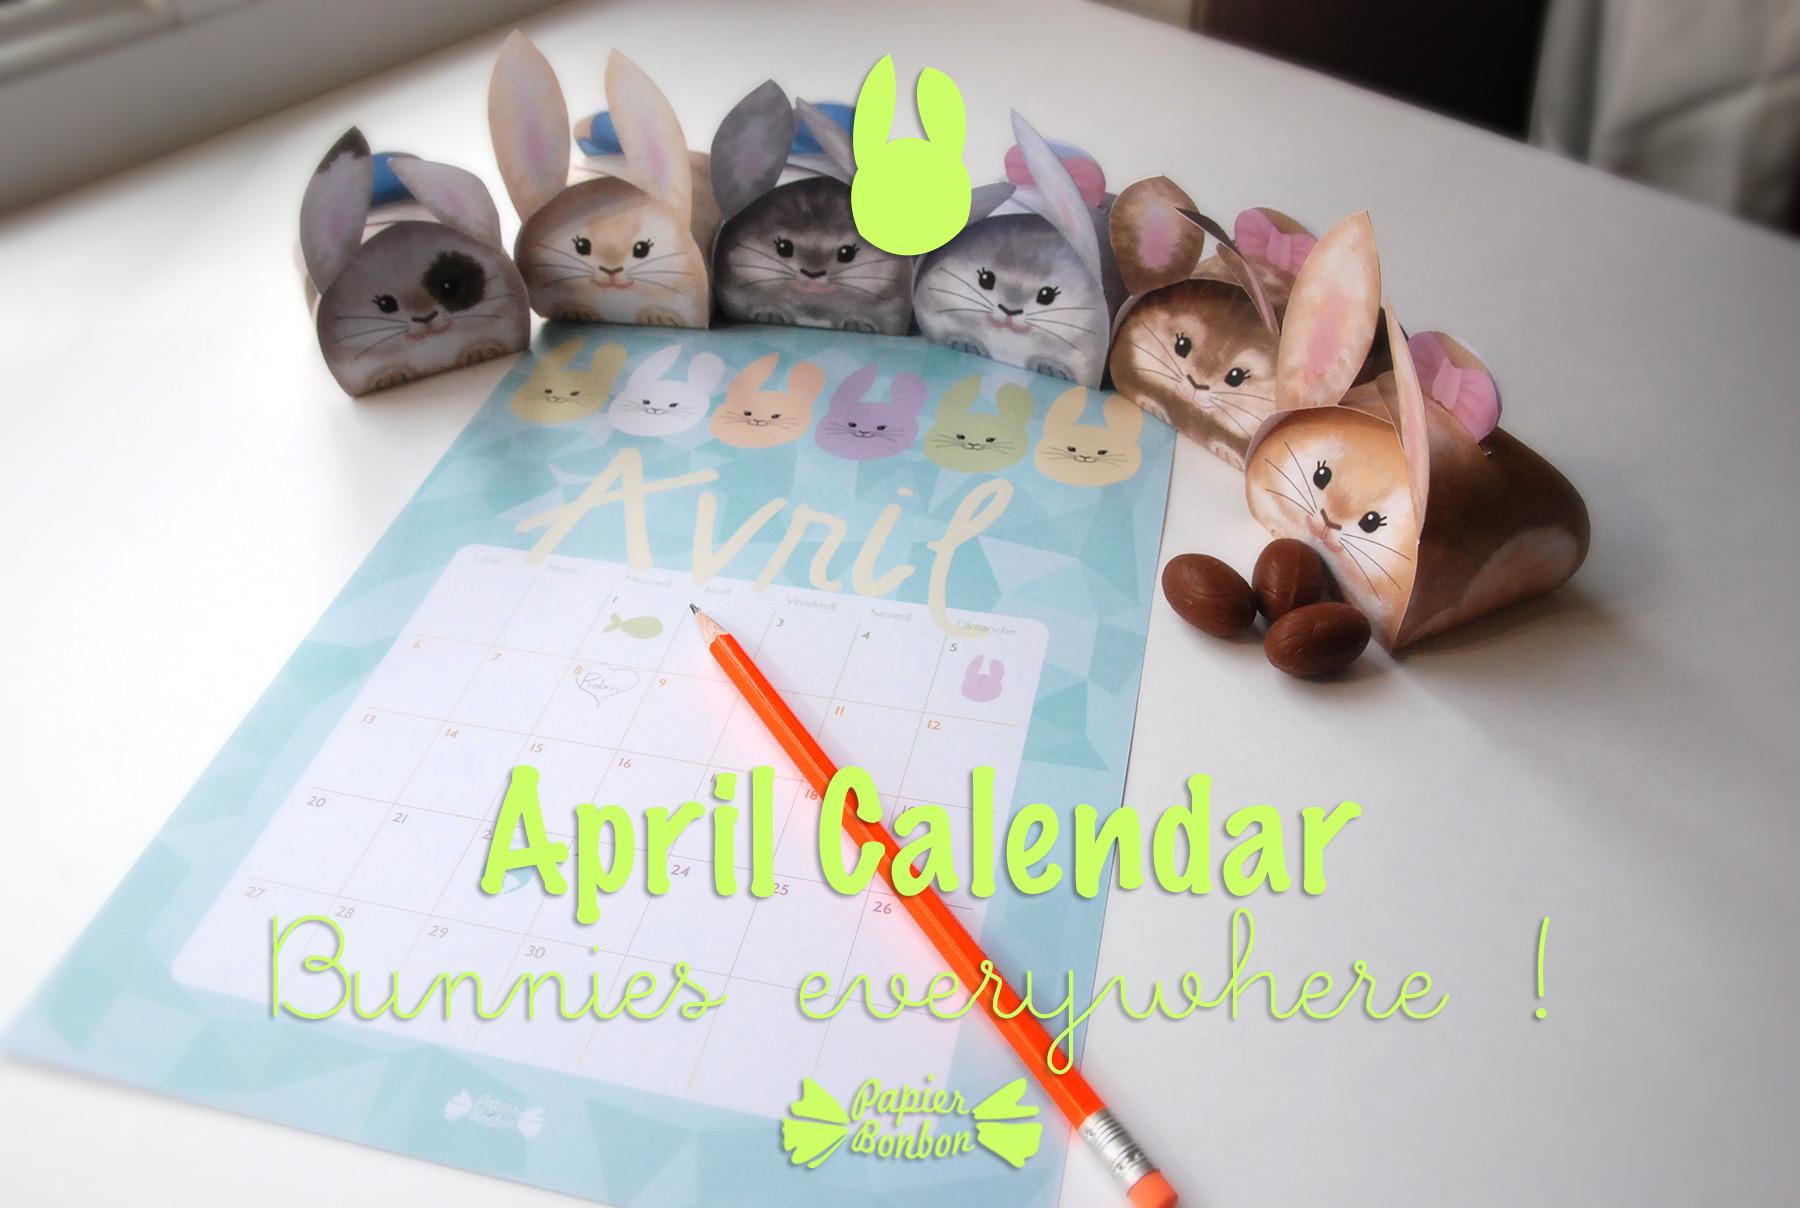 april 2015 calendar printable bunnies everywhere papier bonbon